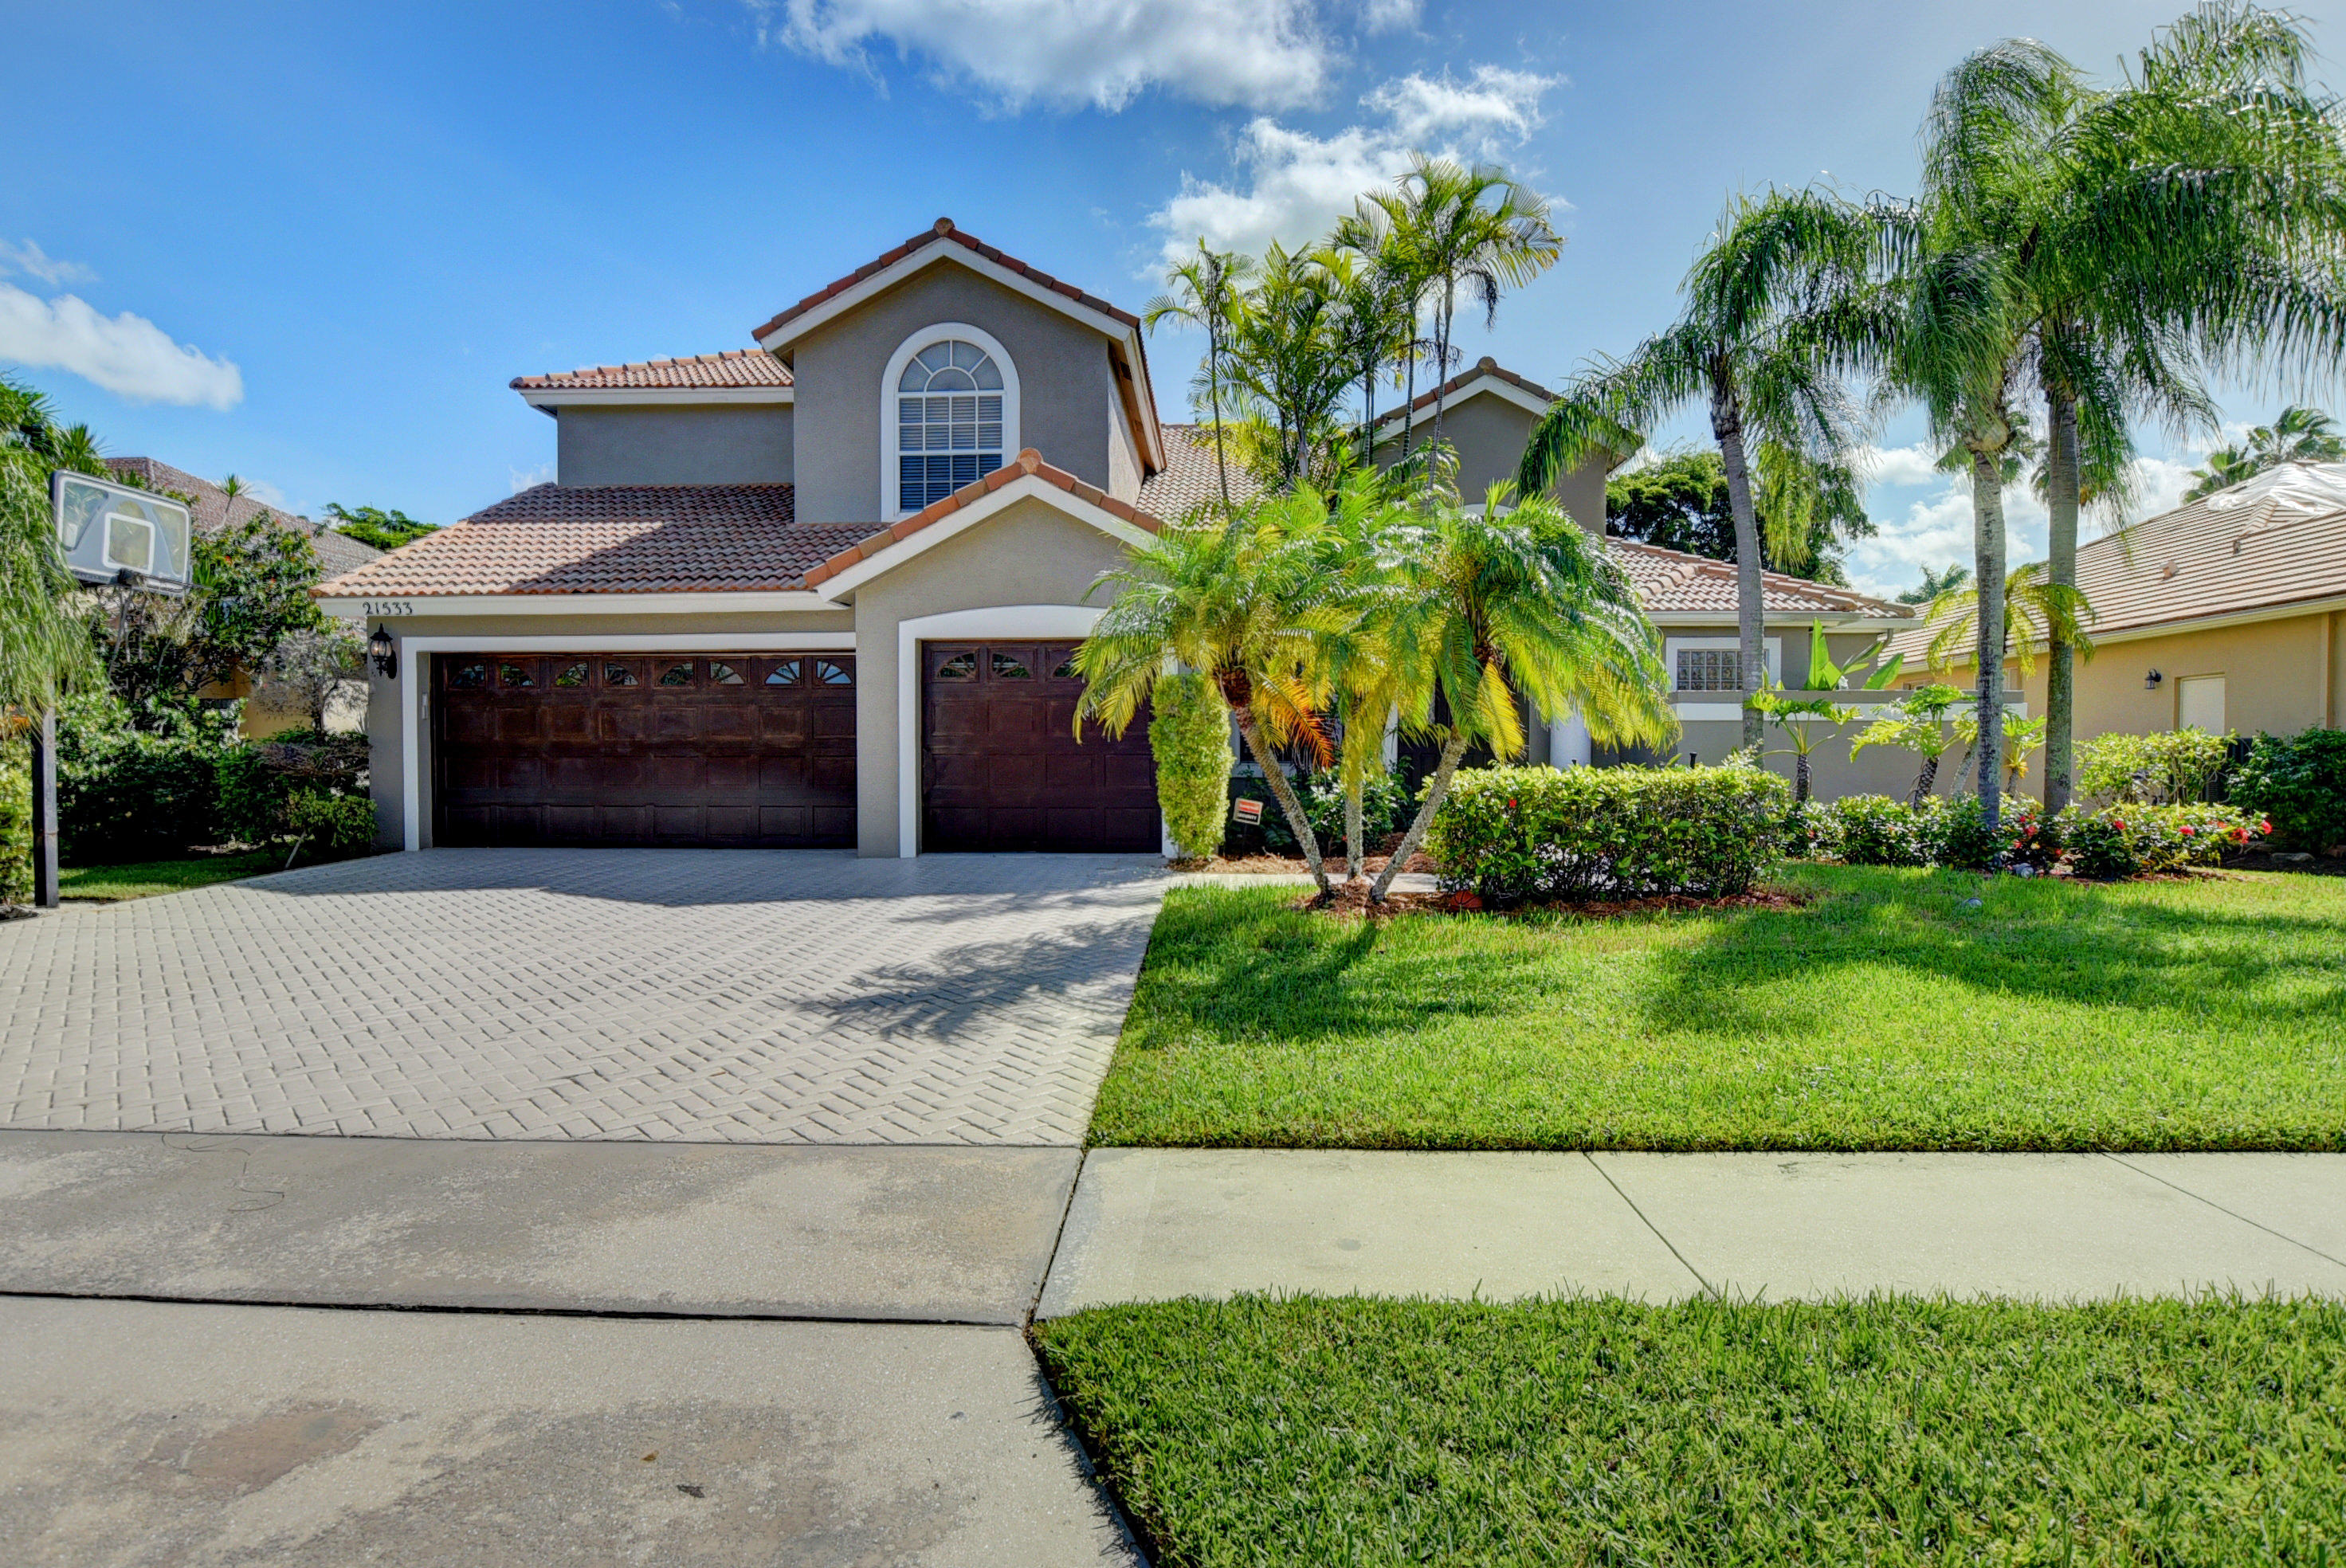 Photo of 21533 Halstead Drive, Boca Raton, FL 33428